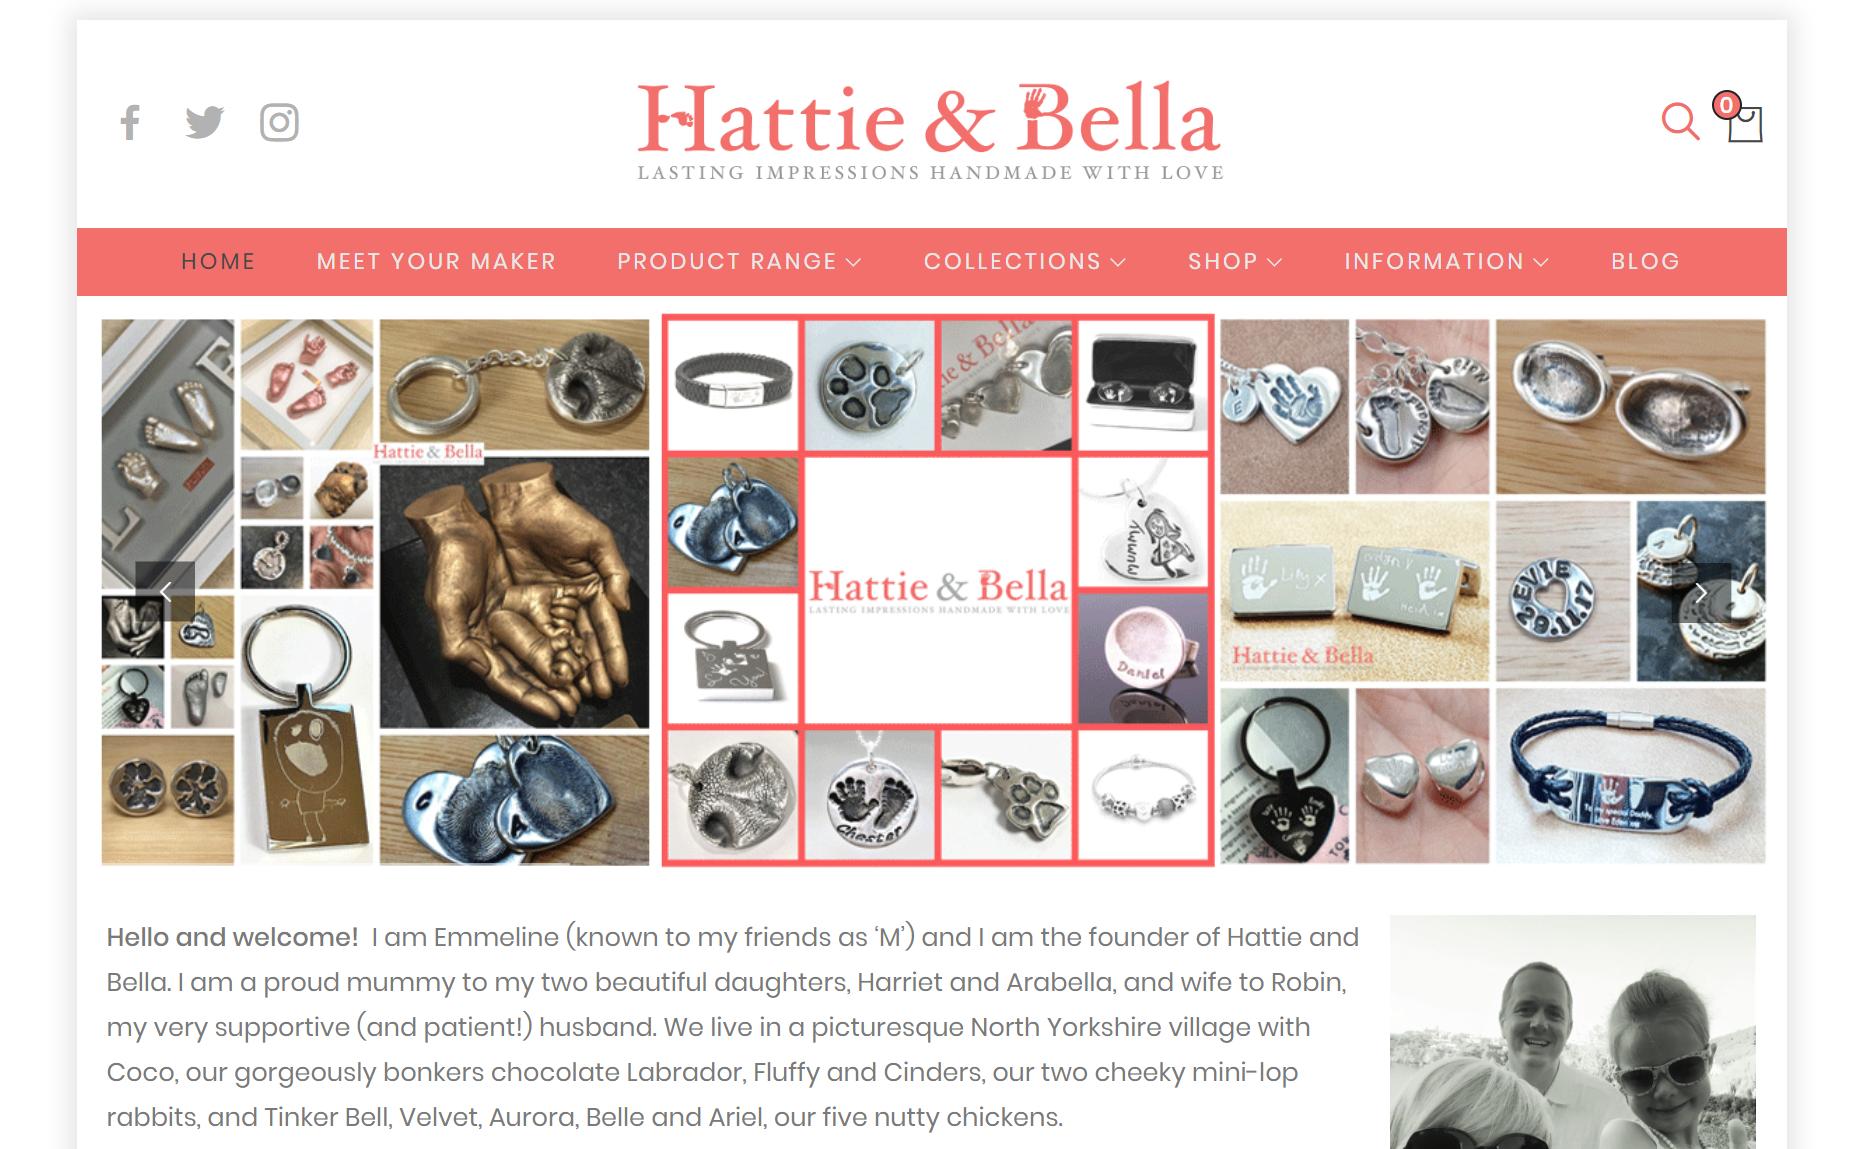 Hattie & Bella (in Development)